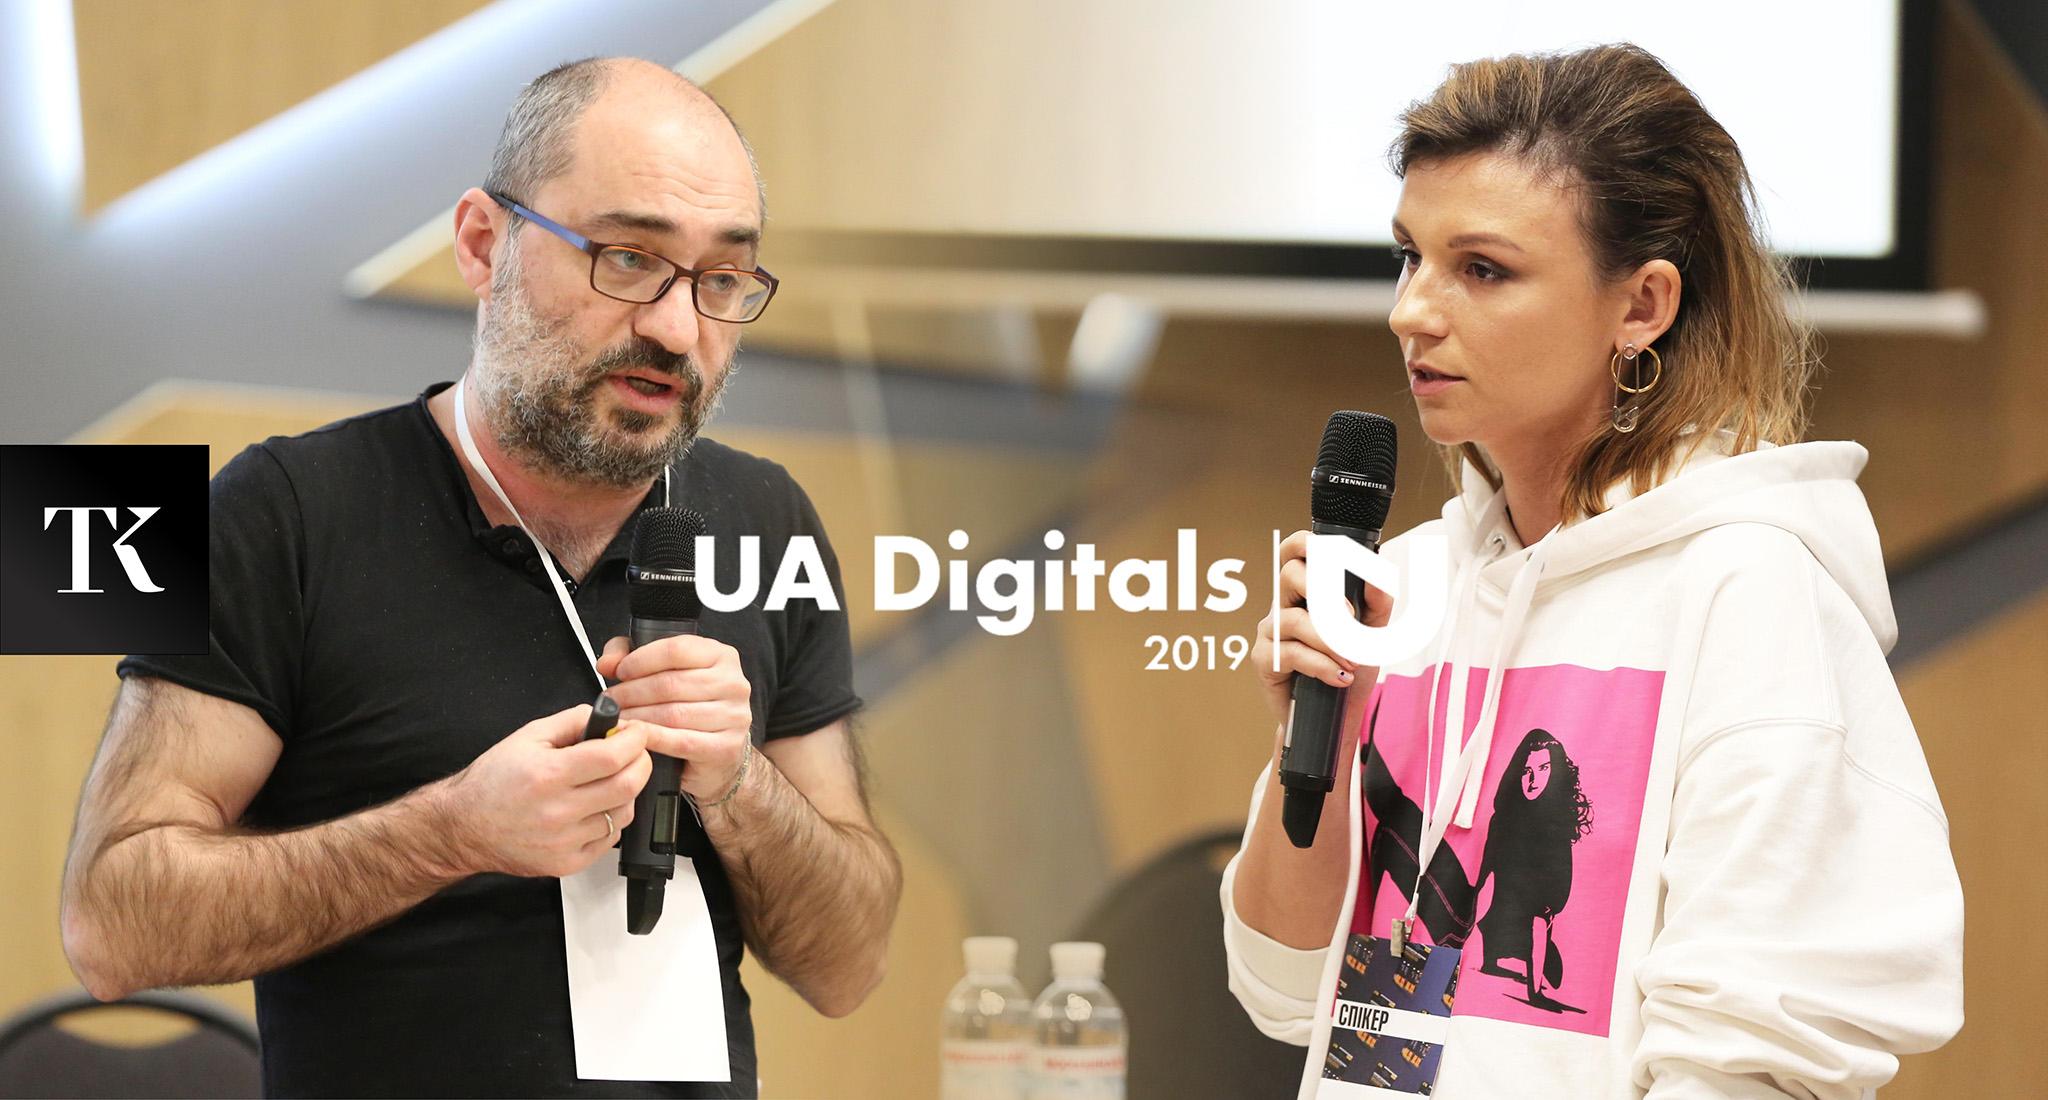 📺 Конференция UA Digitals: как «Плюсы» и StarLight дружат с интернетом